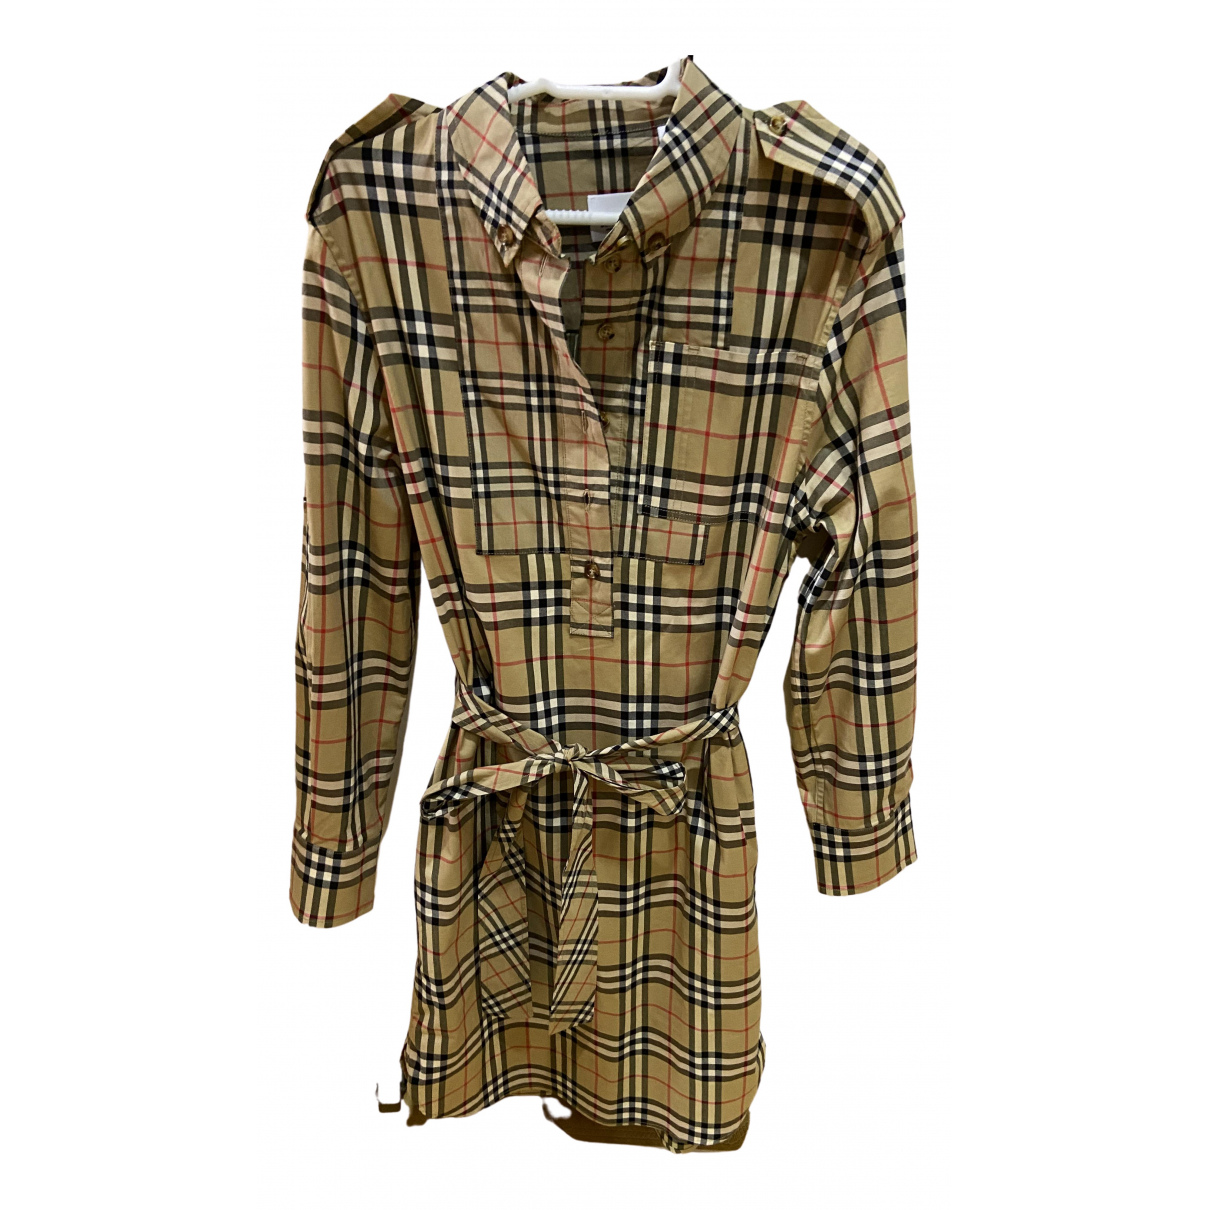 Burberry \N Multicolour Cotton - elasthane dress for Women M International